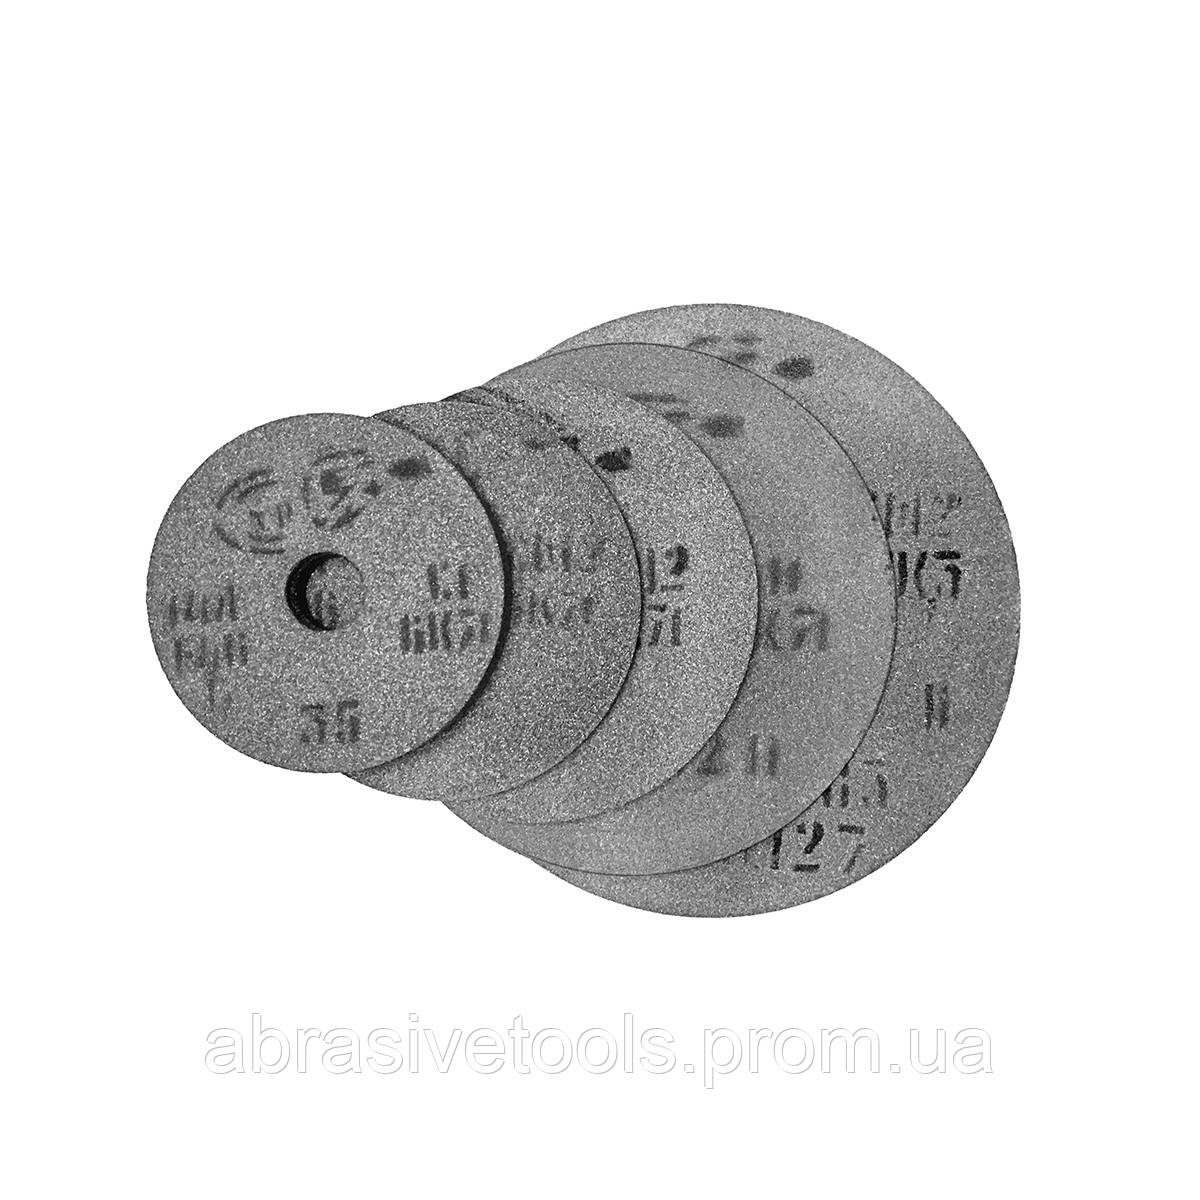 Круг шлифовальный 250х25х76  F46 СТ2